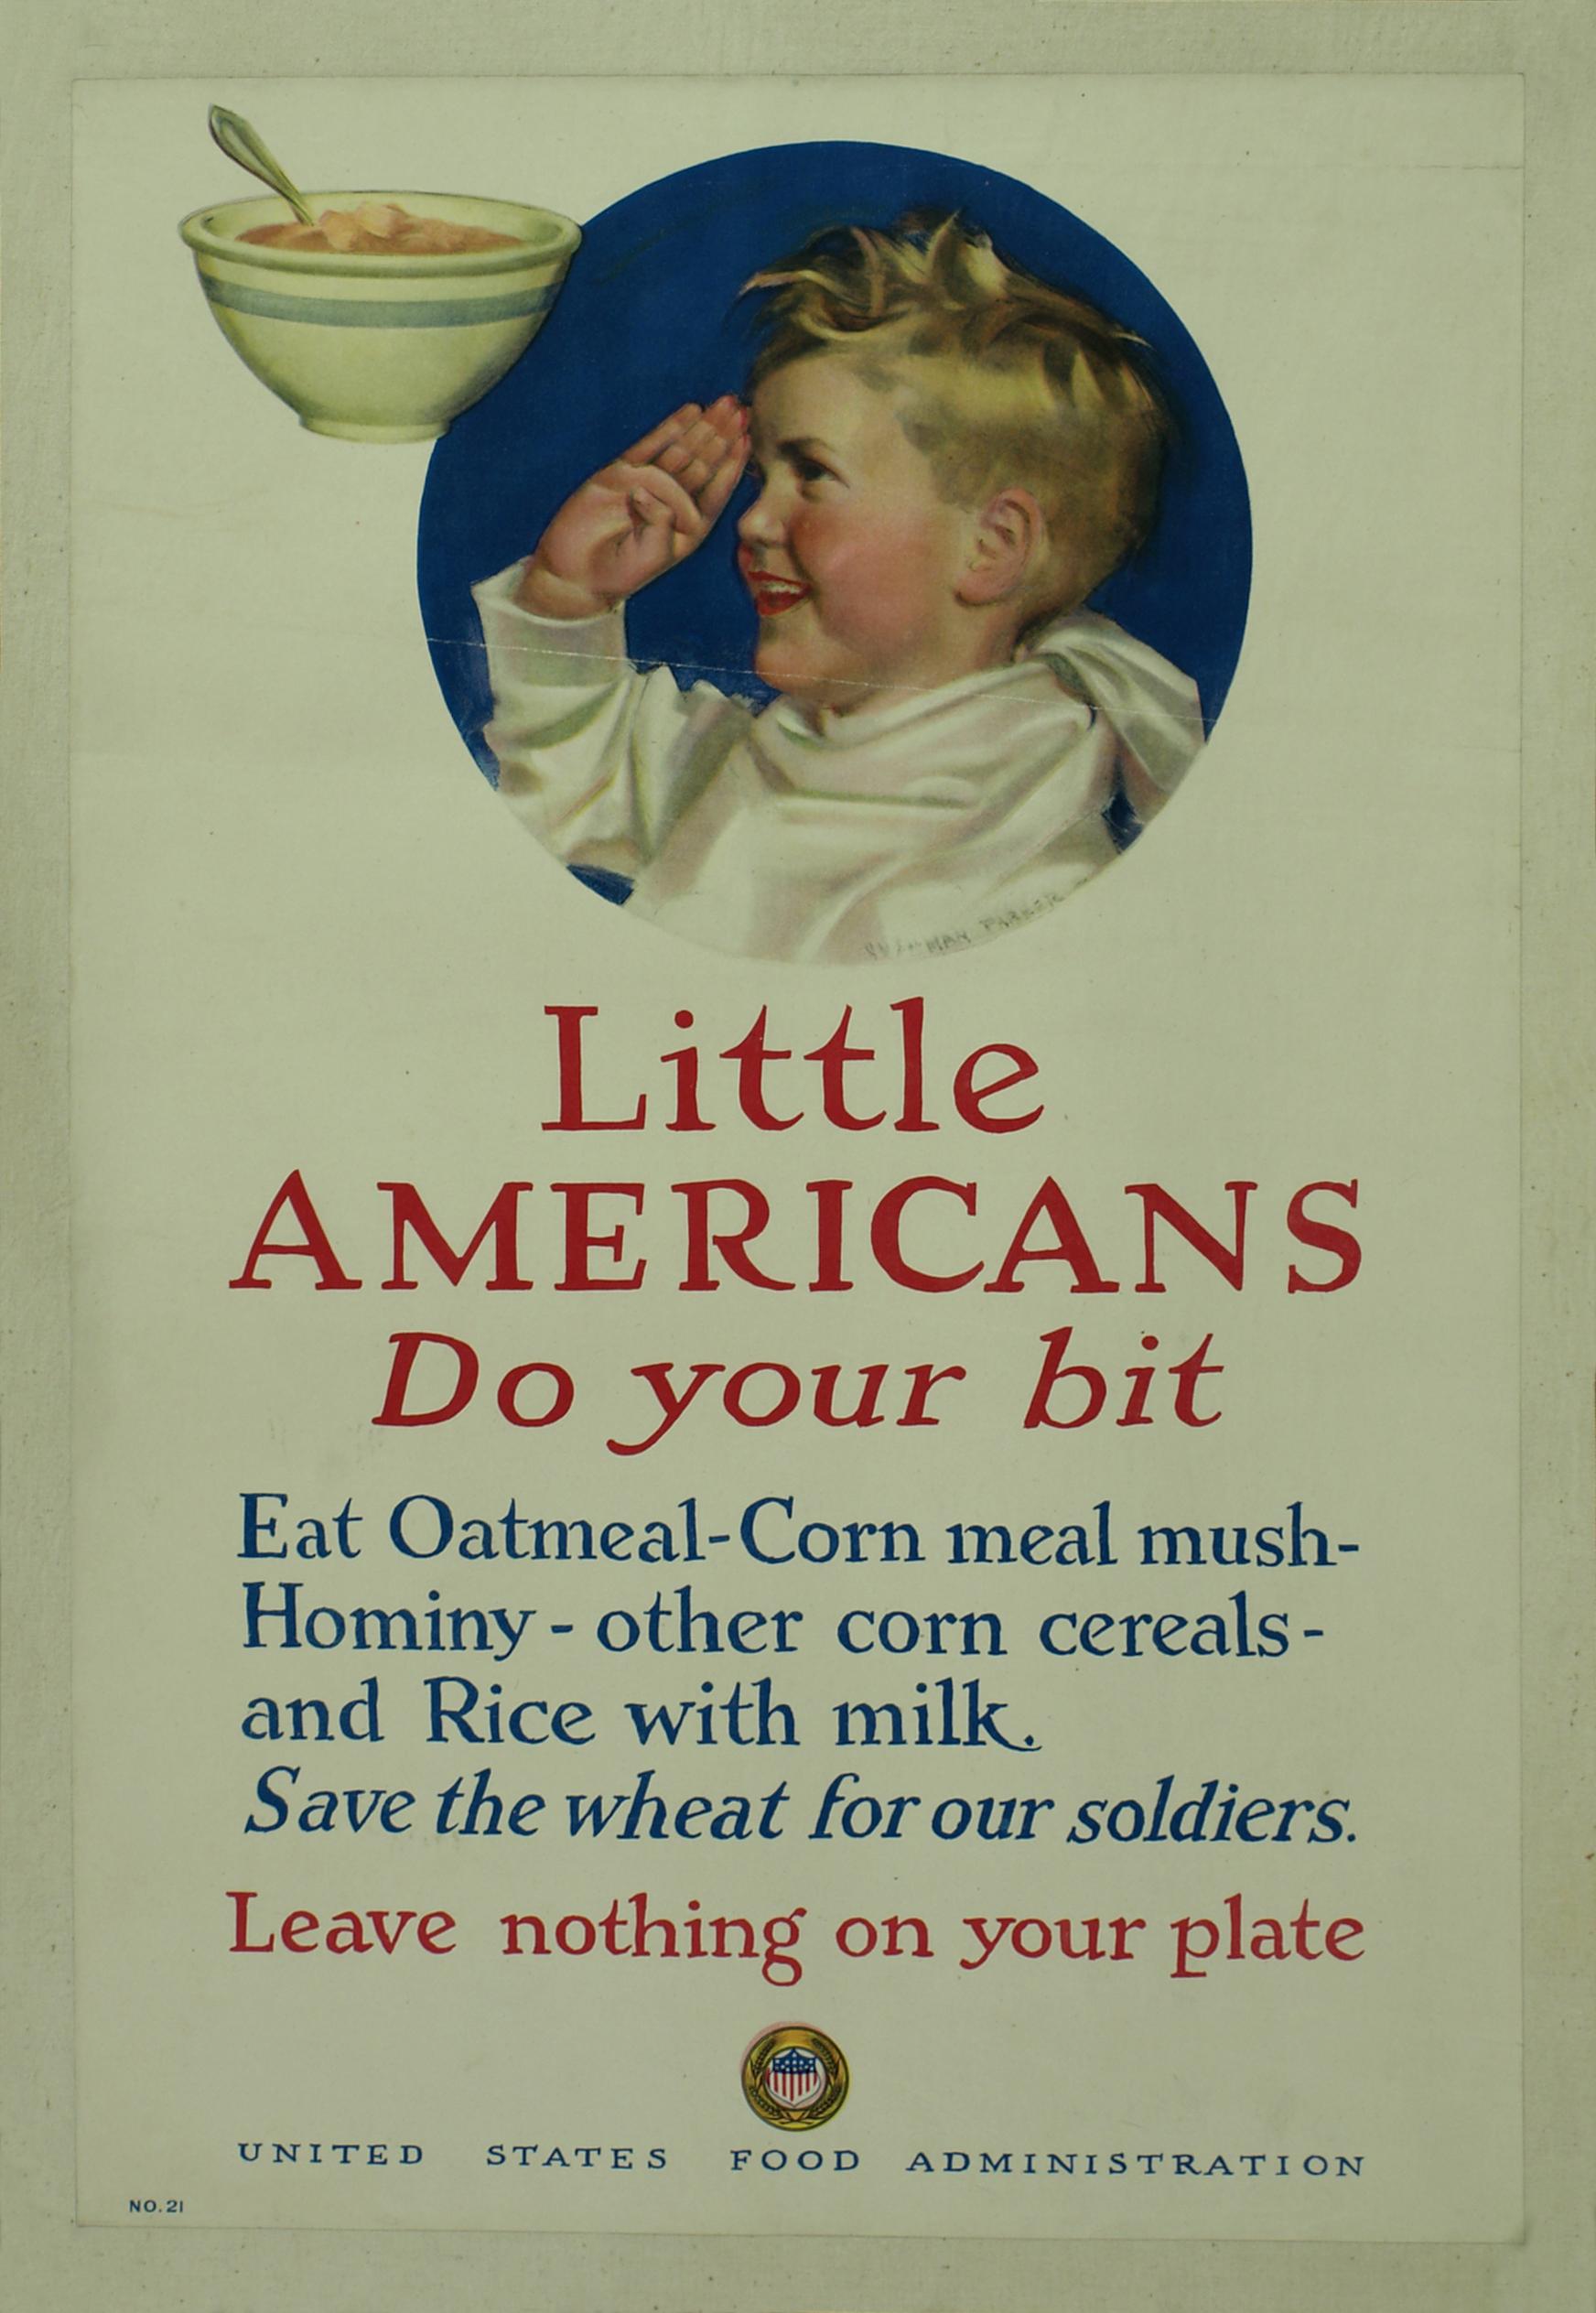 Little Americans (affiche) - Databank Agrippa, Letterenhuis